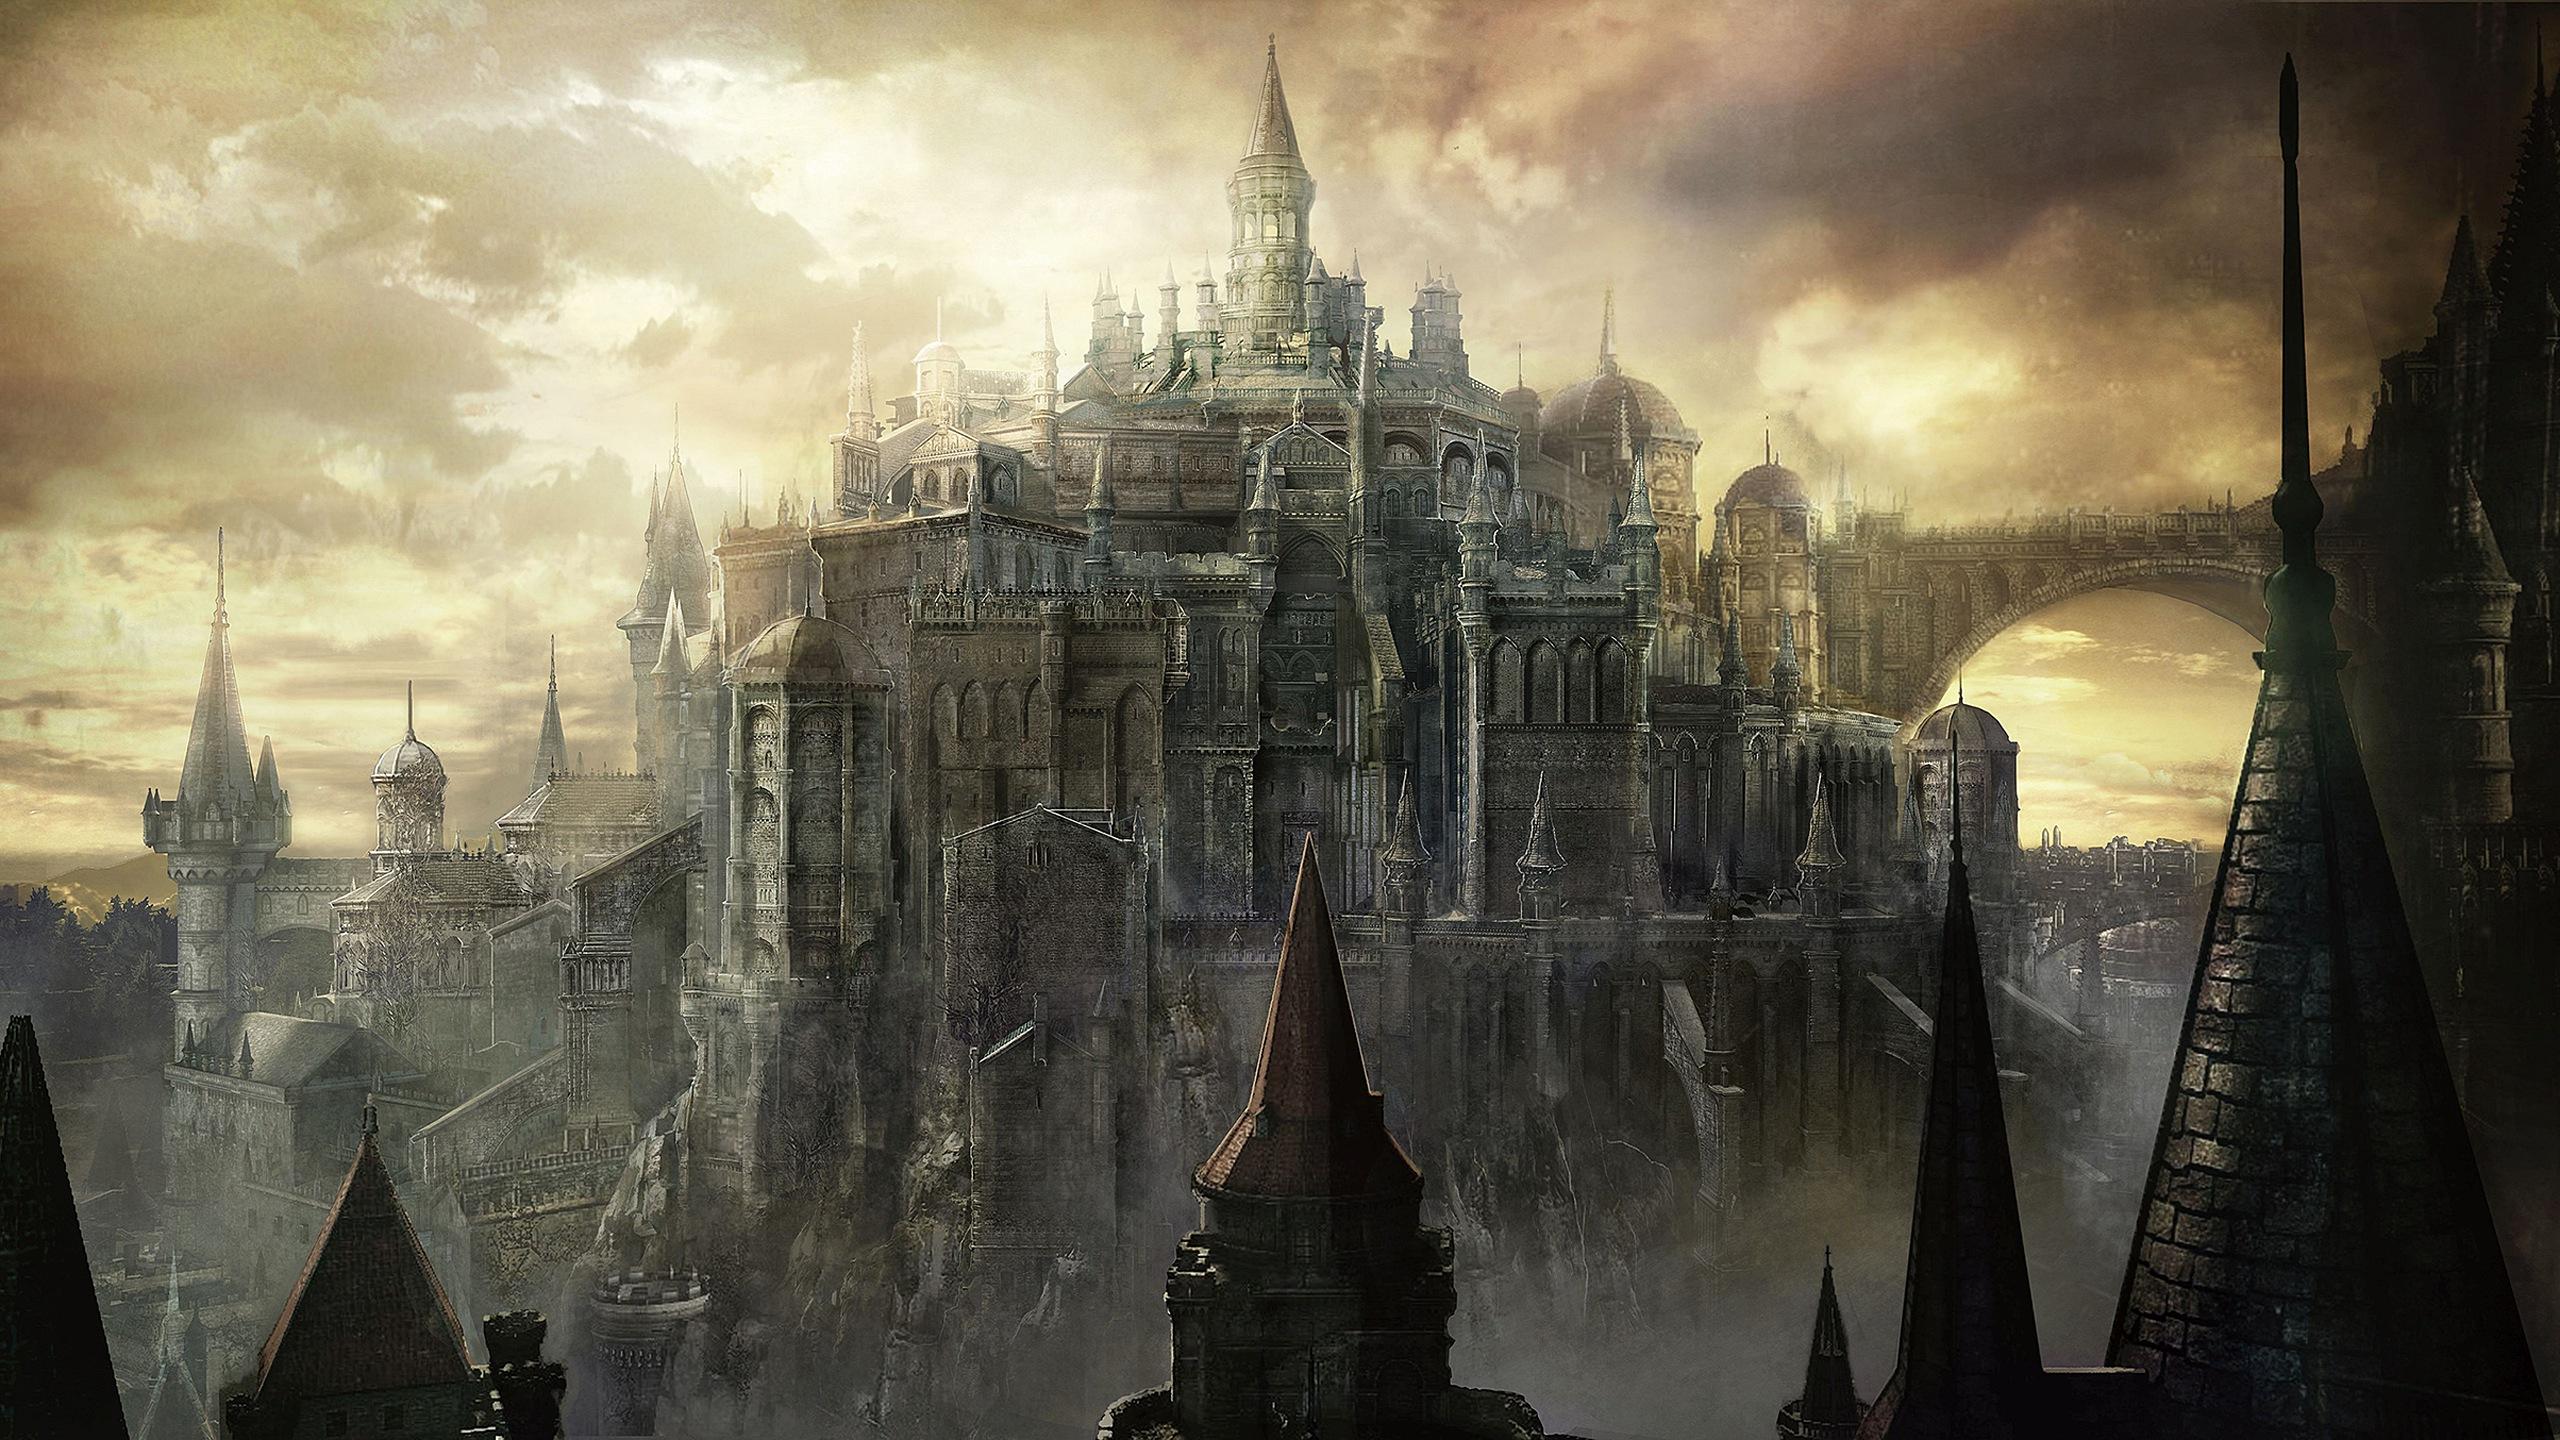 132 Dark Souls III HD Wallpapers   Backgrounds - Wallpaper Abyss